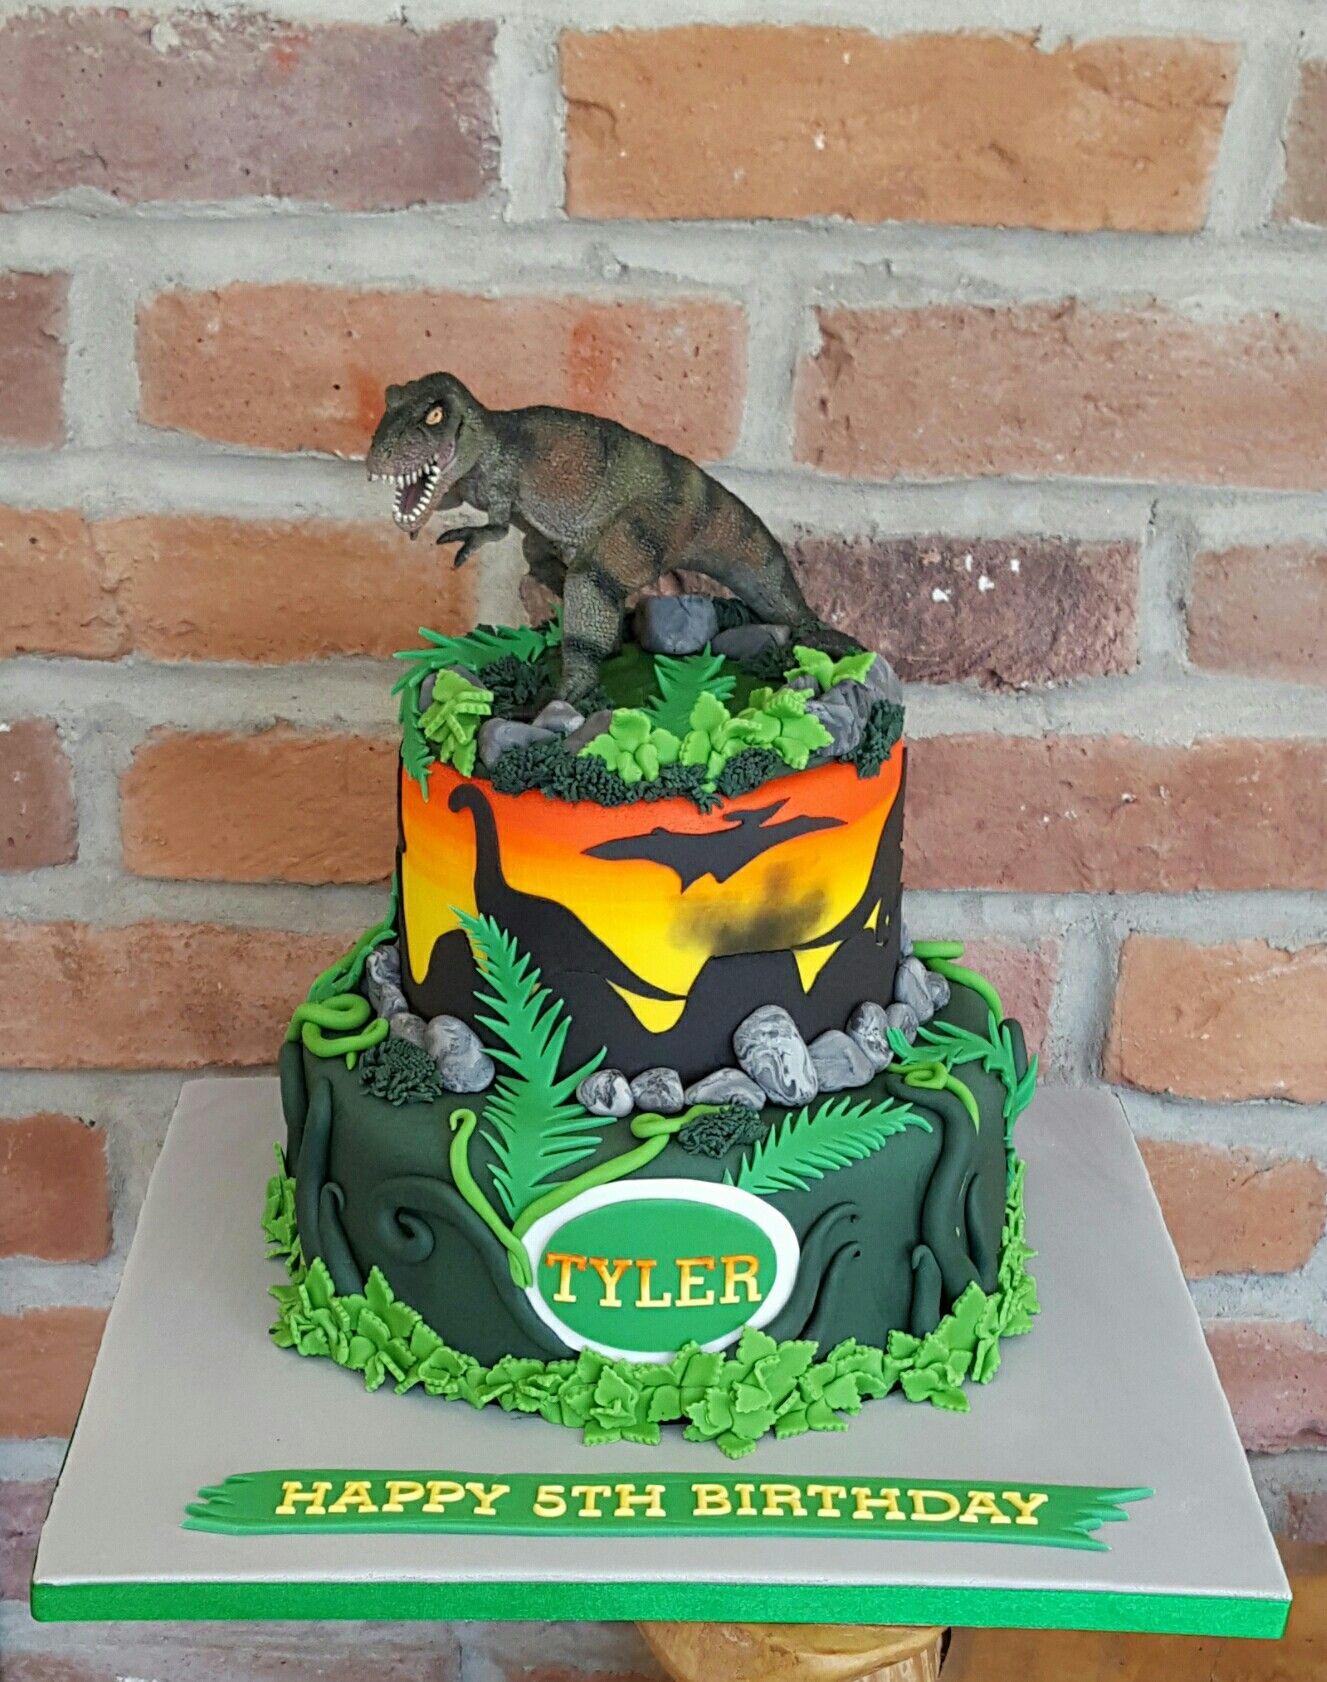 Jurassic World Dinosaur Cake Dinosaur Birthday Cakes Jurassic Park Birthday Party Dinosaur Theme Party